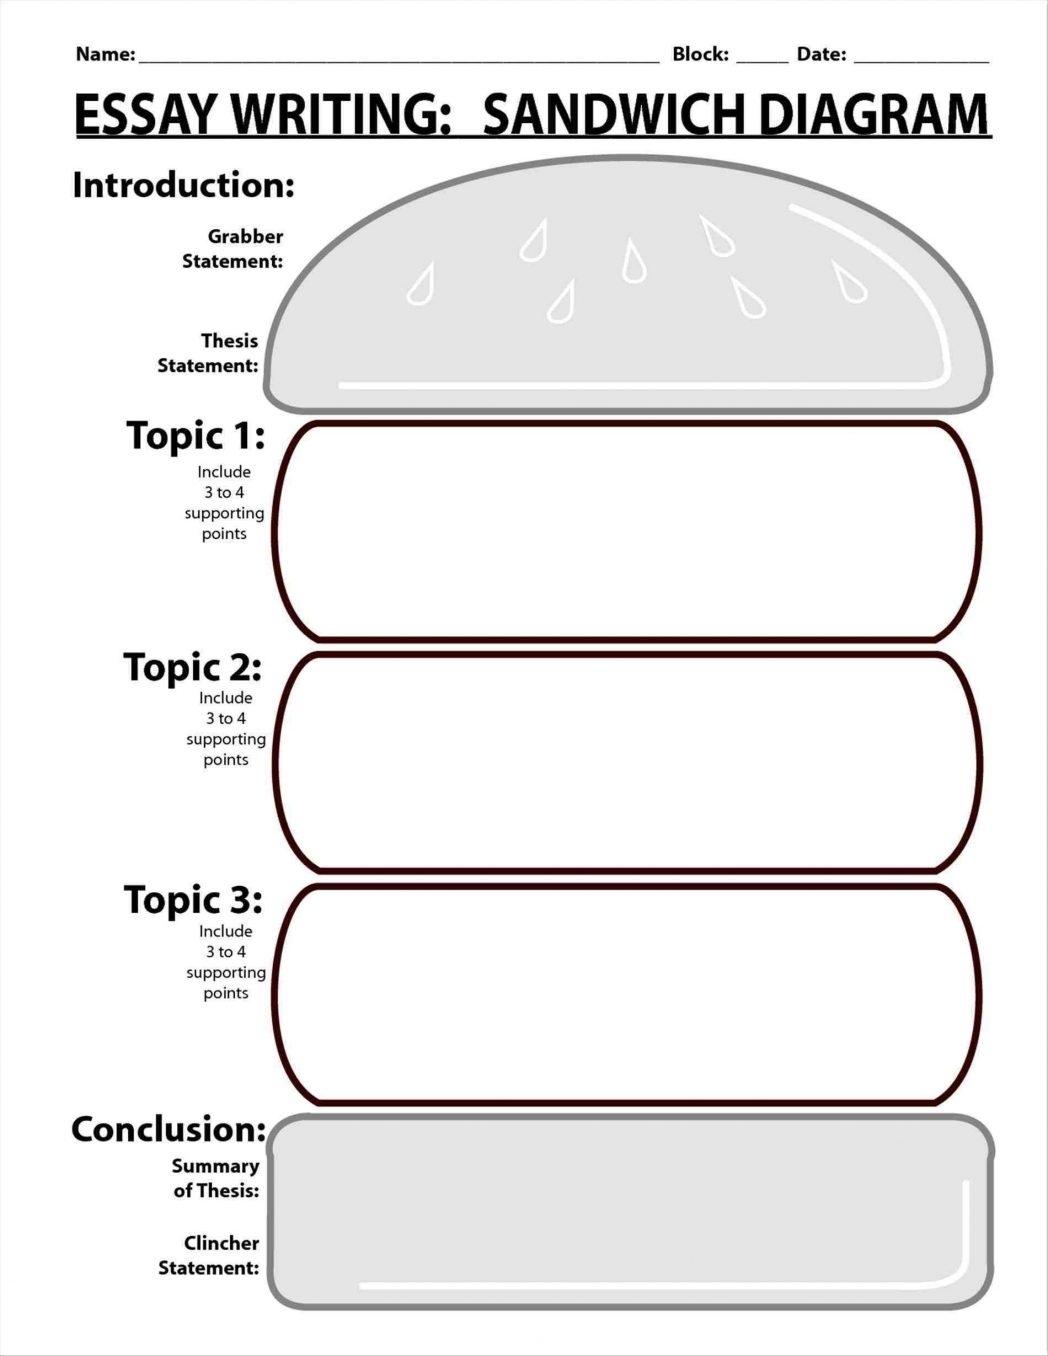 010 Paragraph Essay Graphic Organizer Hamburger Writings And Essays Inside Elementary Example Wonderful Five High School Definition 5 Pdf Full